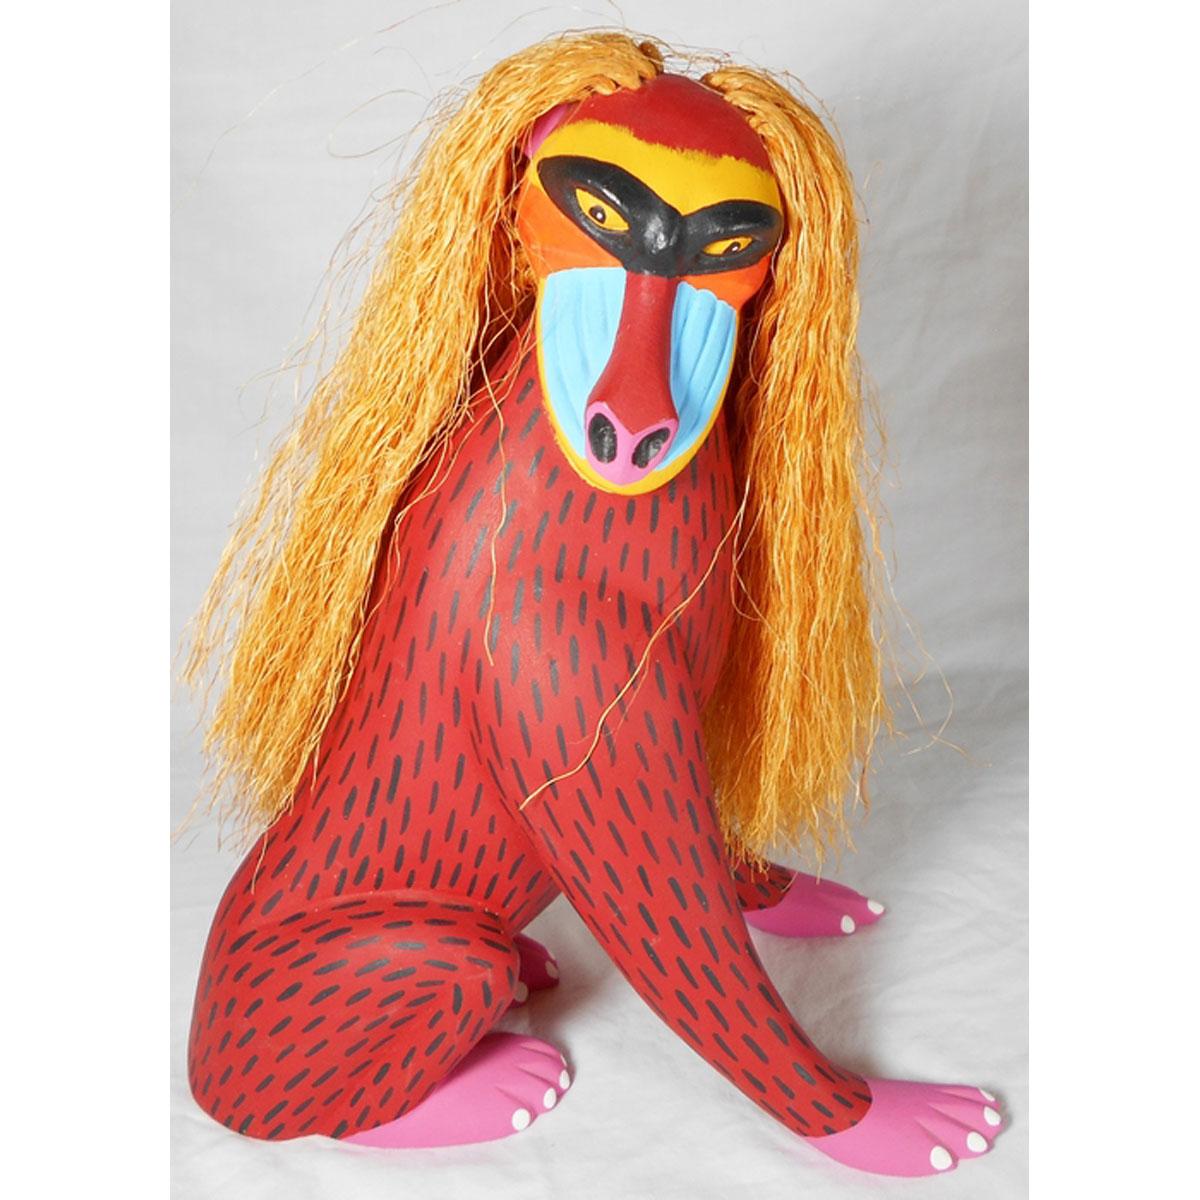 Luis Pablo Luis Pablo: Mandrill Baboon